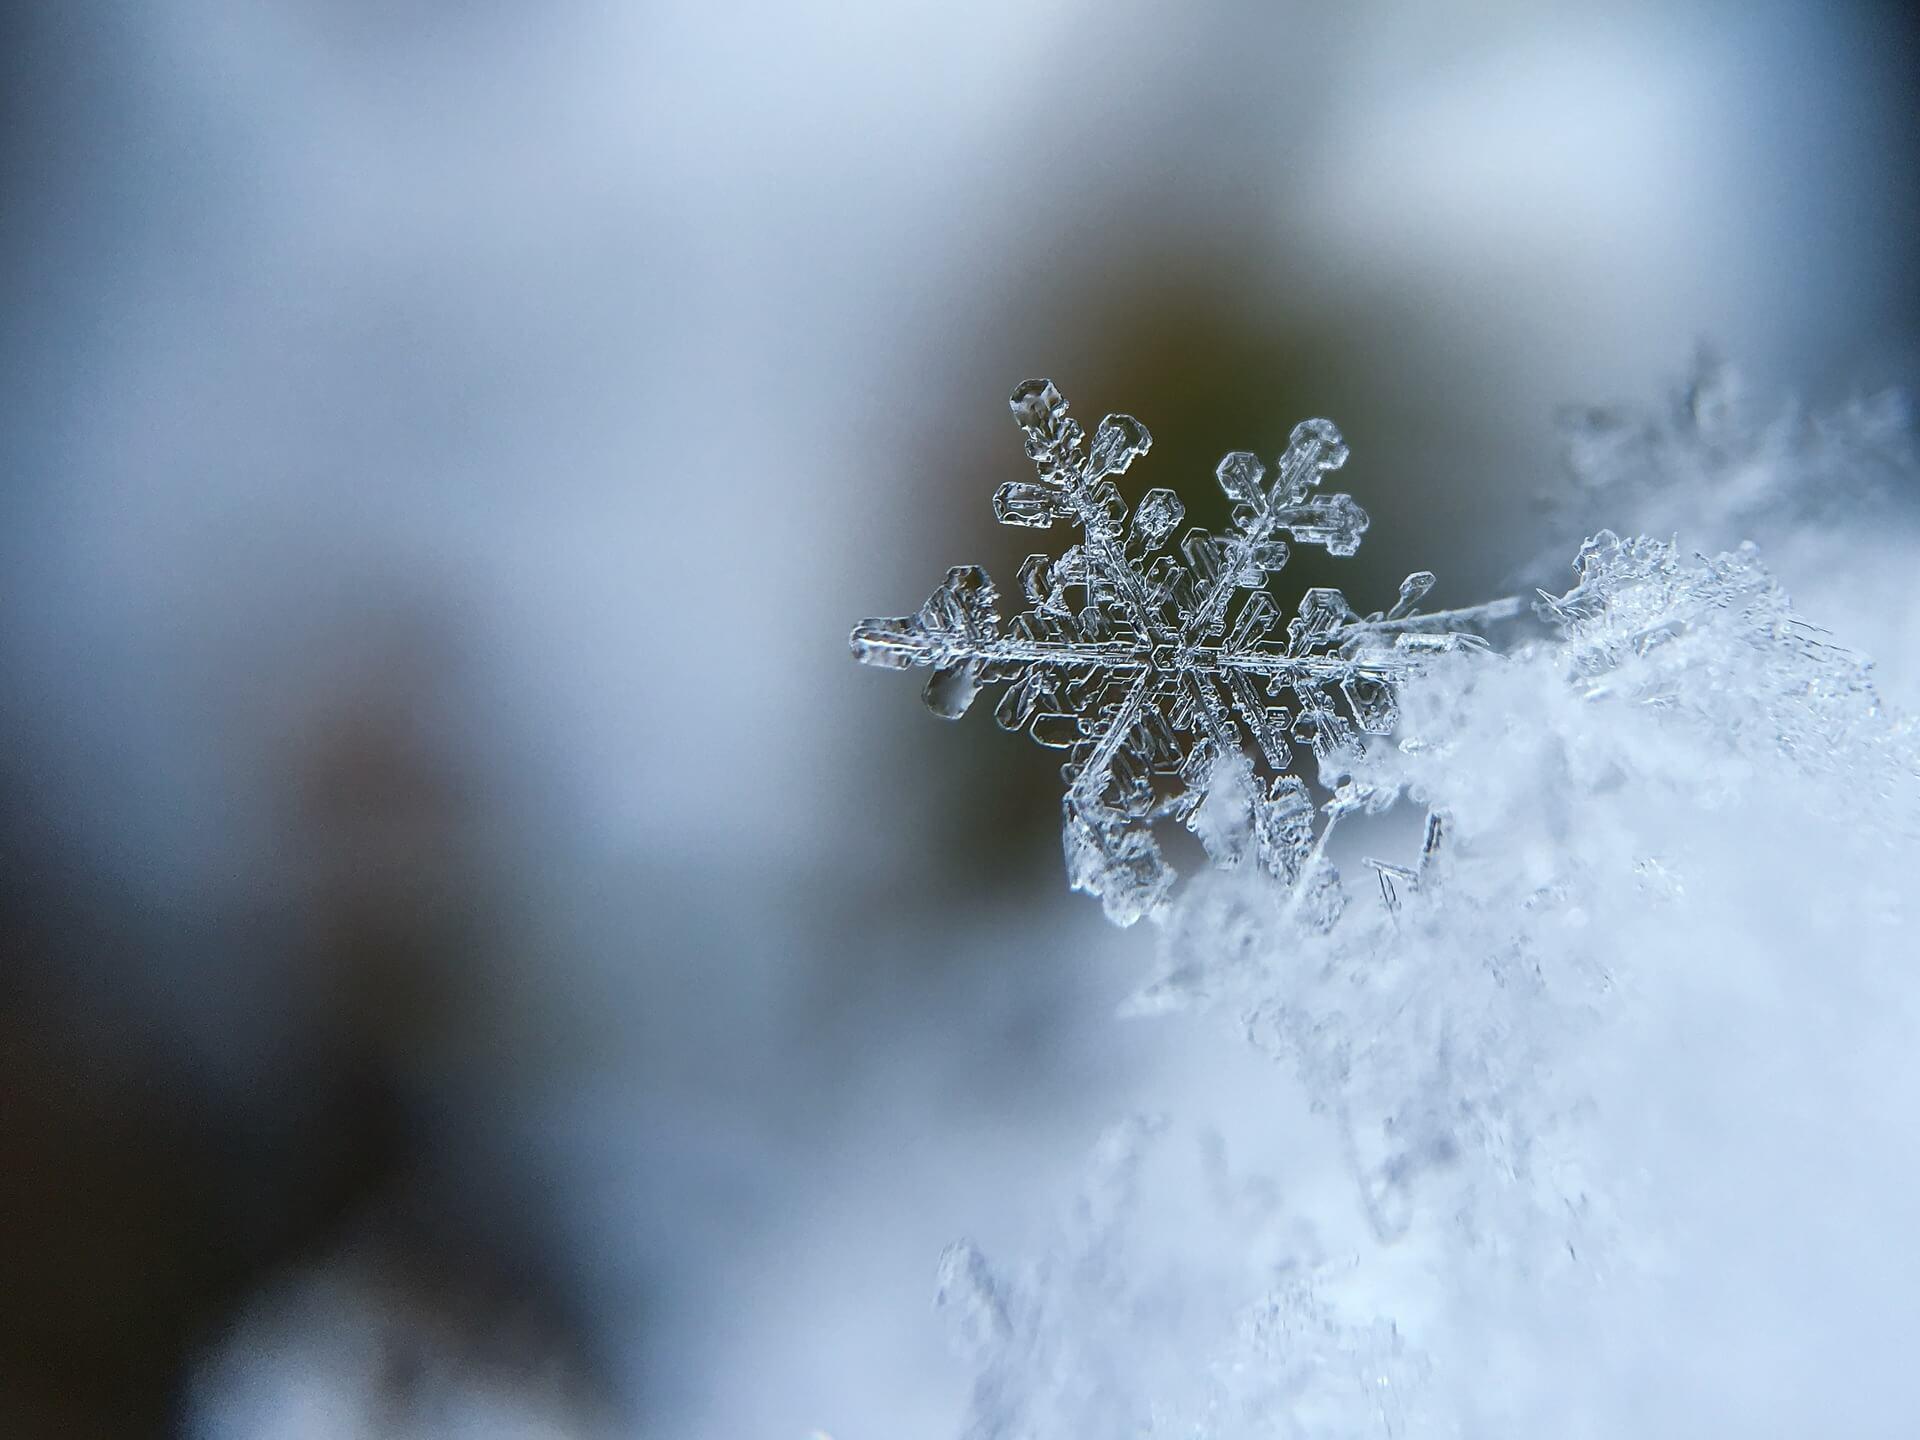 snowflake winter frozen weather